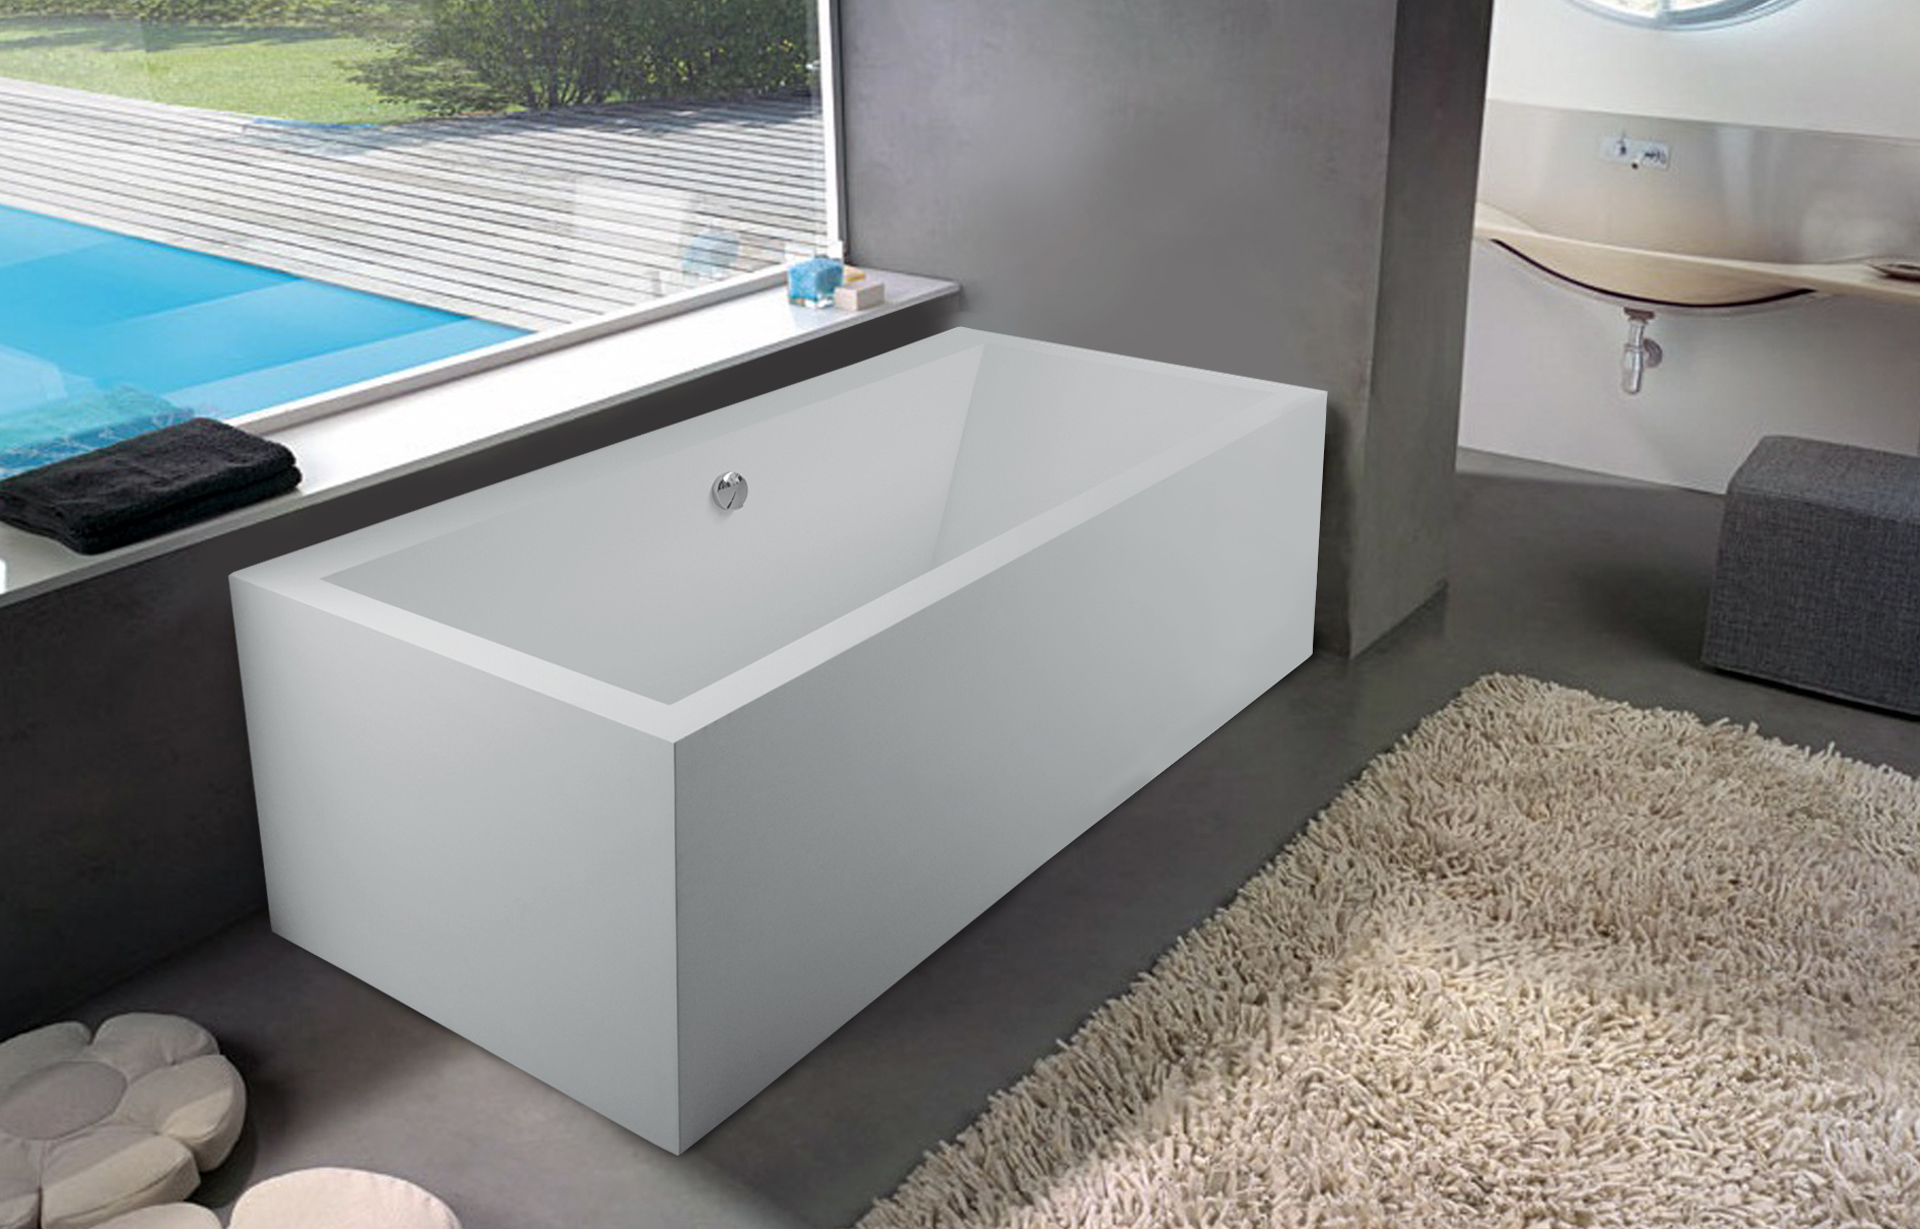 Aquatica PureScape 714M Freestanding AquaStone Bathtub